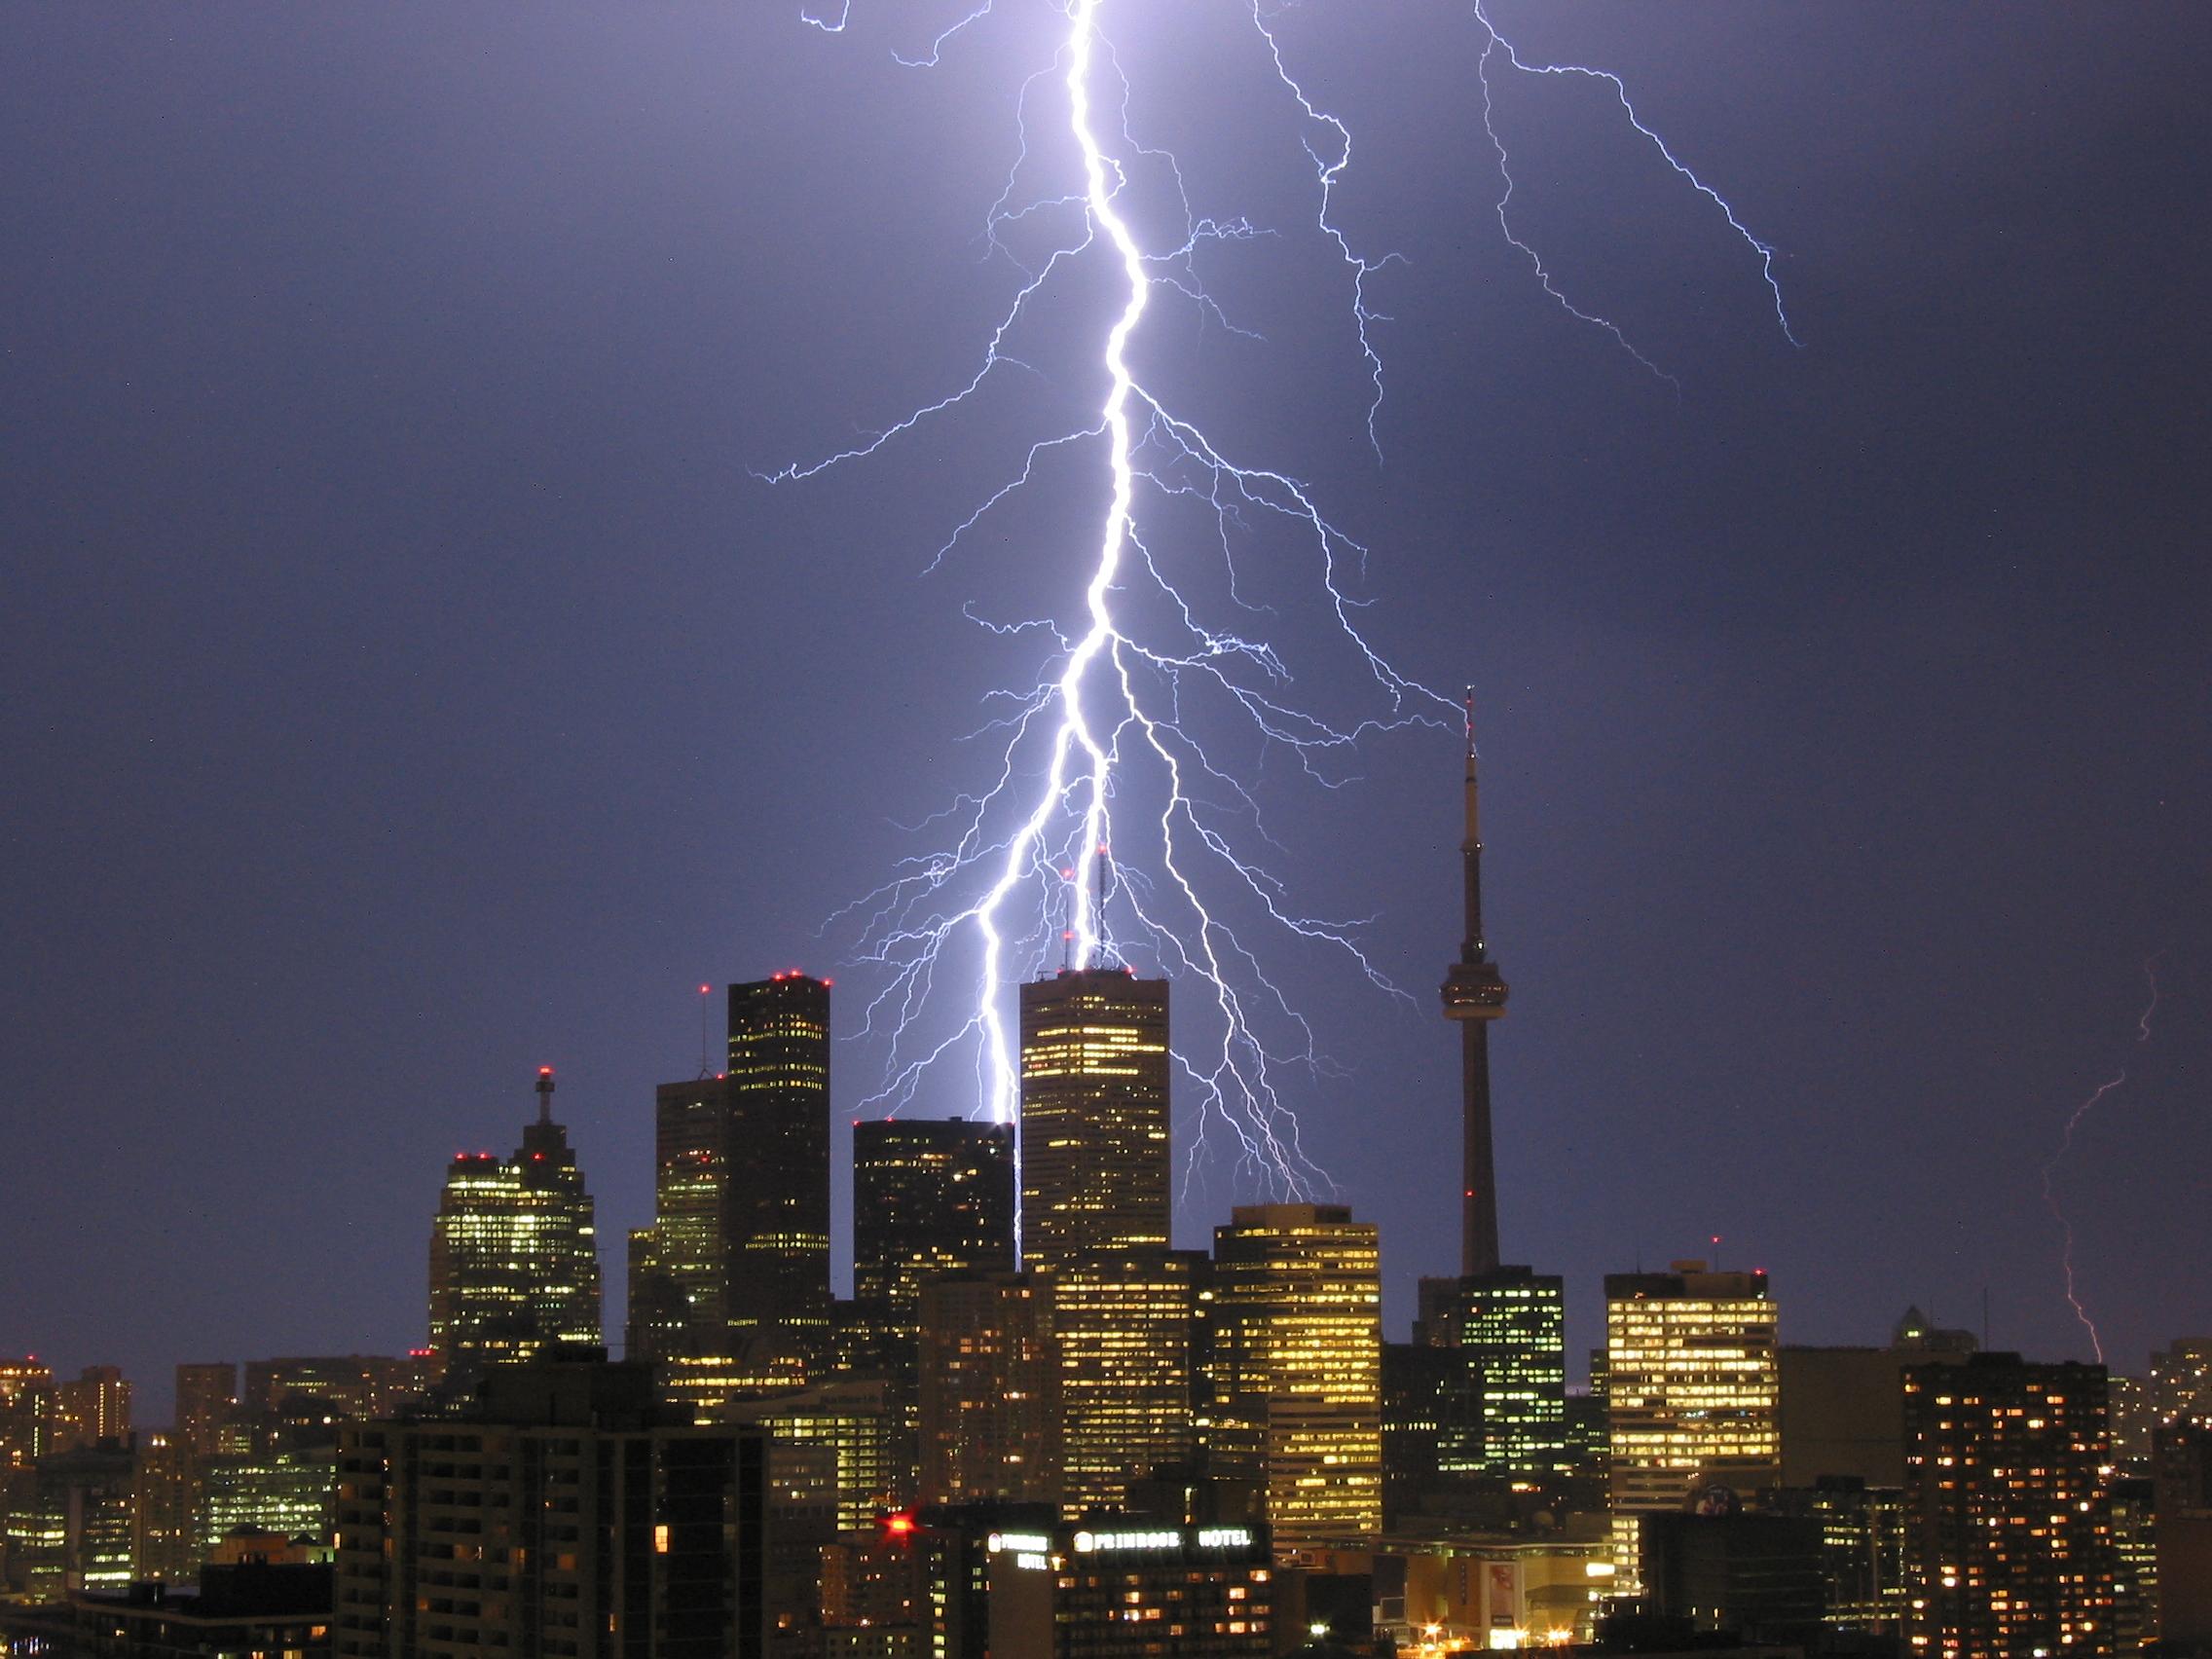 2003-Aug-23 - Toronto thunderstorm